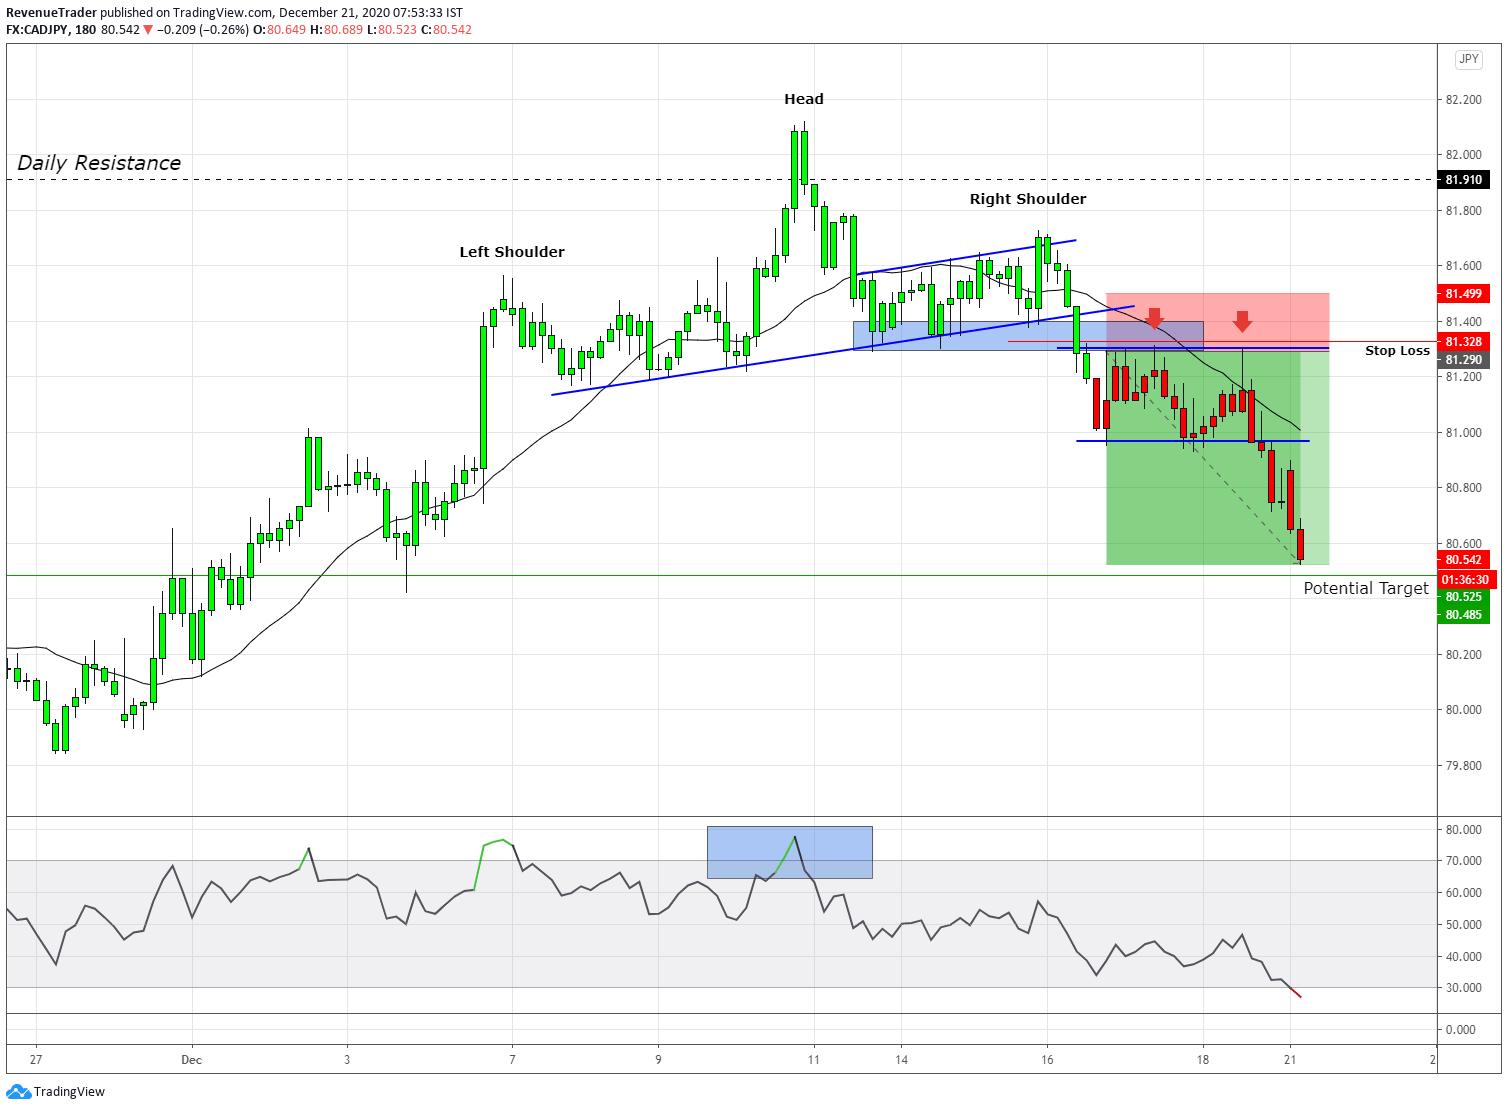 CADJPY 3.66R on trend reversal trade